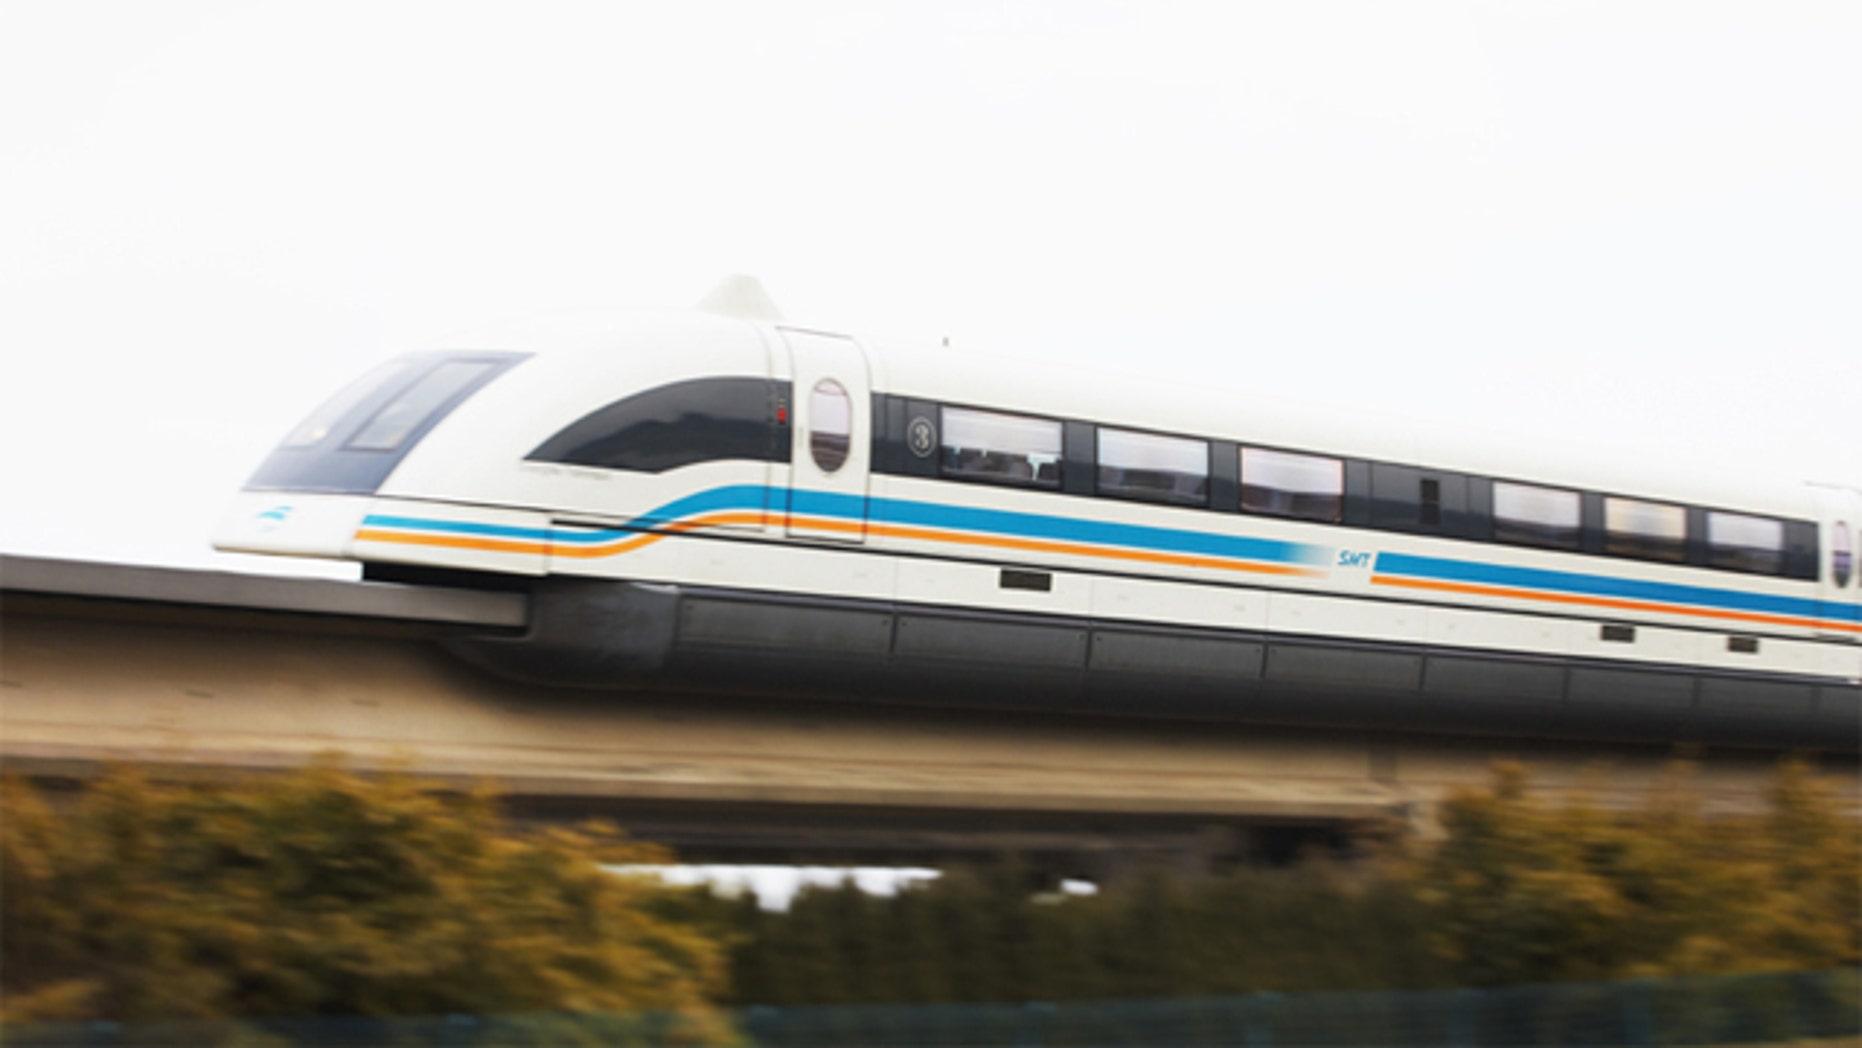 A maglev train runs from Shanghai International airport to Pudong, Shanghai, China.